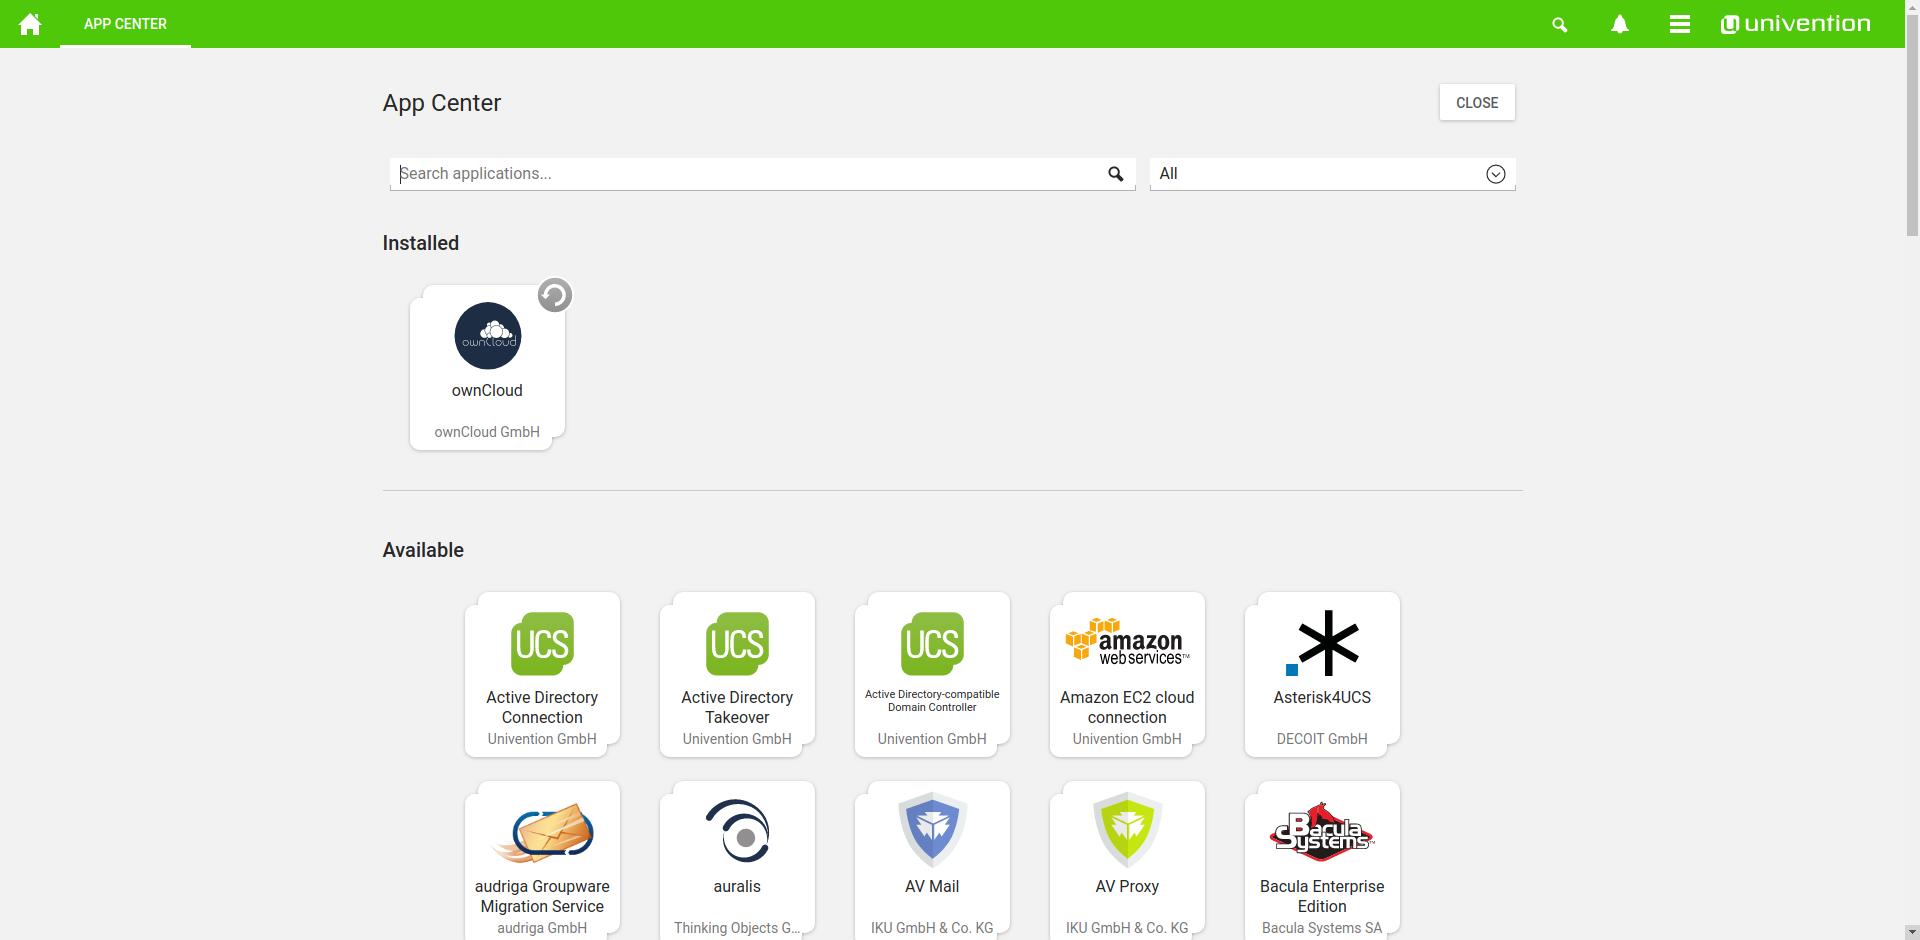 ownCloud univention appliance app center